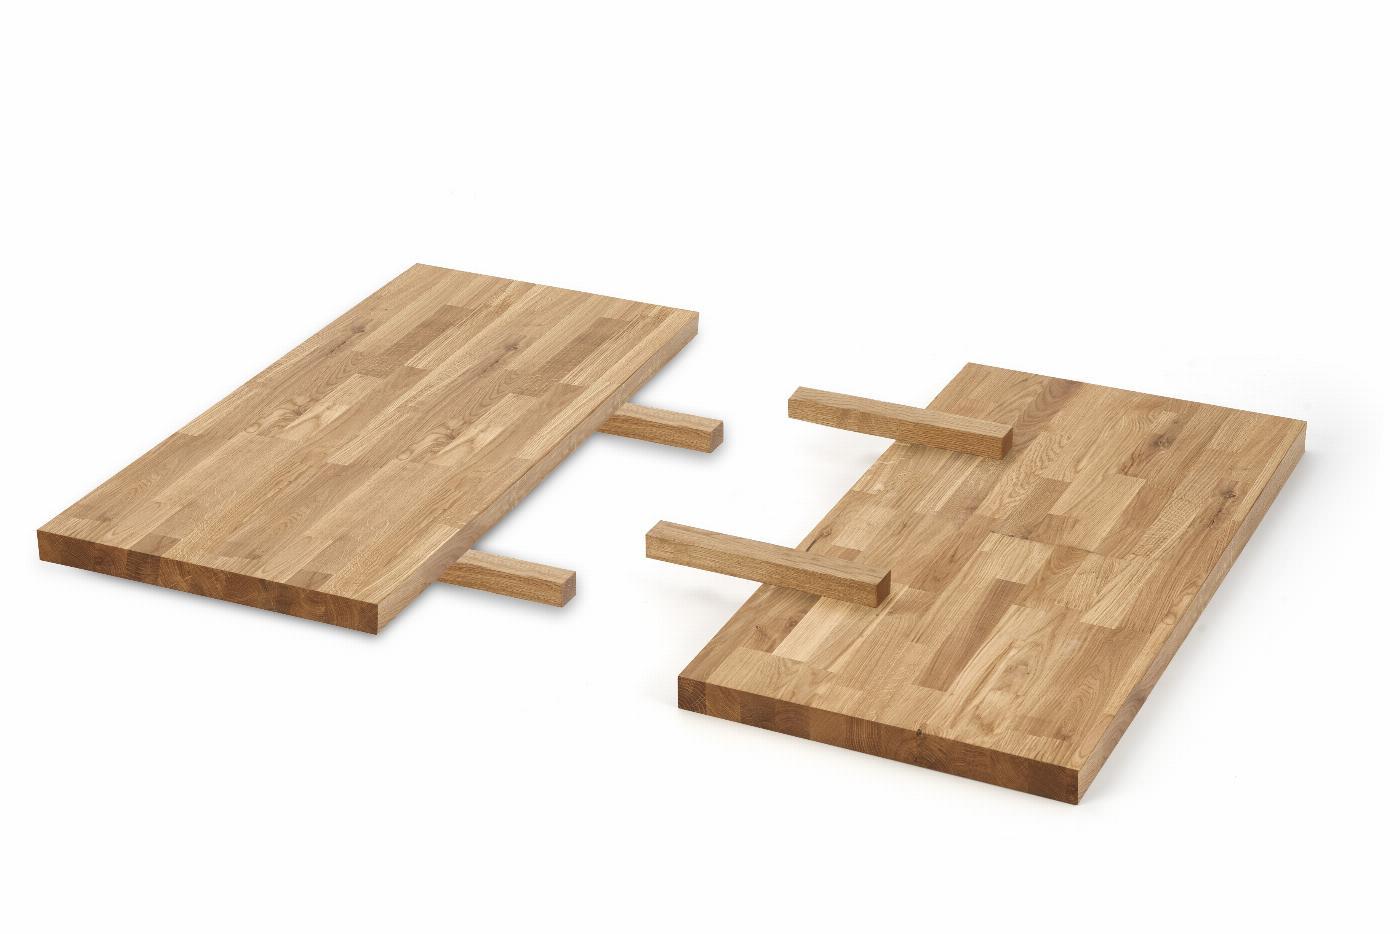 APEX & RADUS - przedłużka blatu 78x40 cm; drewno lite - dębowe kolor: dąb naturalny (1p=1szt)